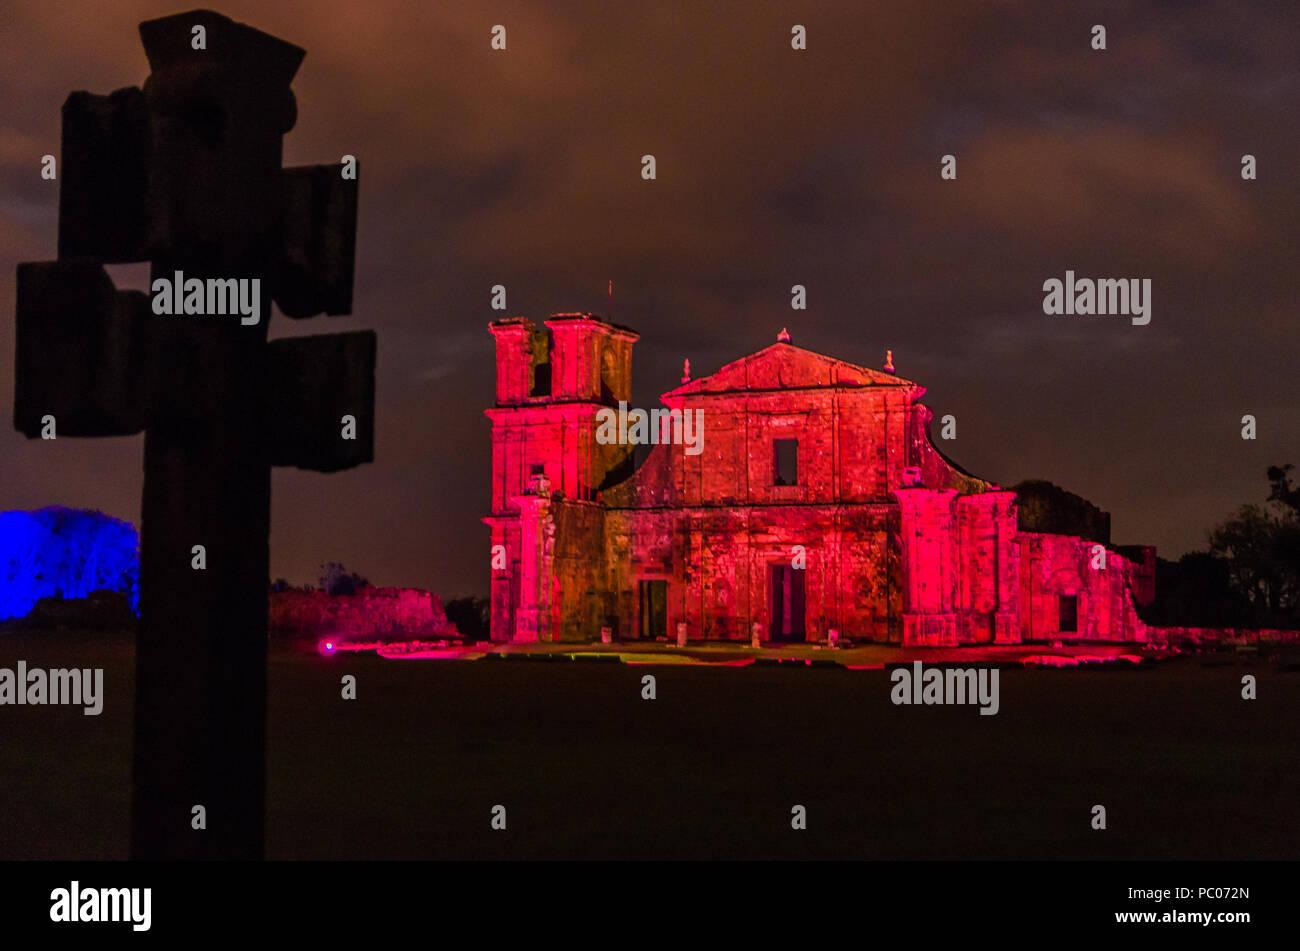 Part of the UNESCO site - Jesuit Missions of the Guaranis: Church, Ruins of Sao Miguel das Missoe, Rio Grande do Sul, Brazil. - Stock Image